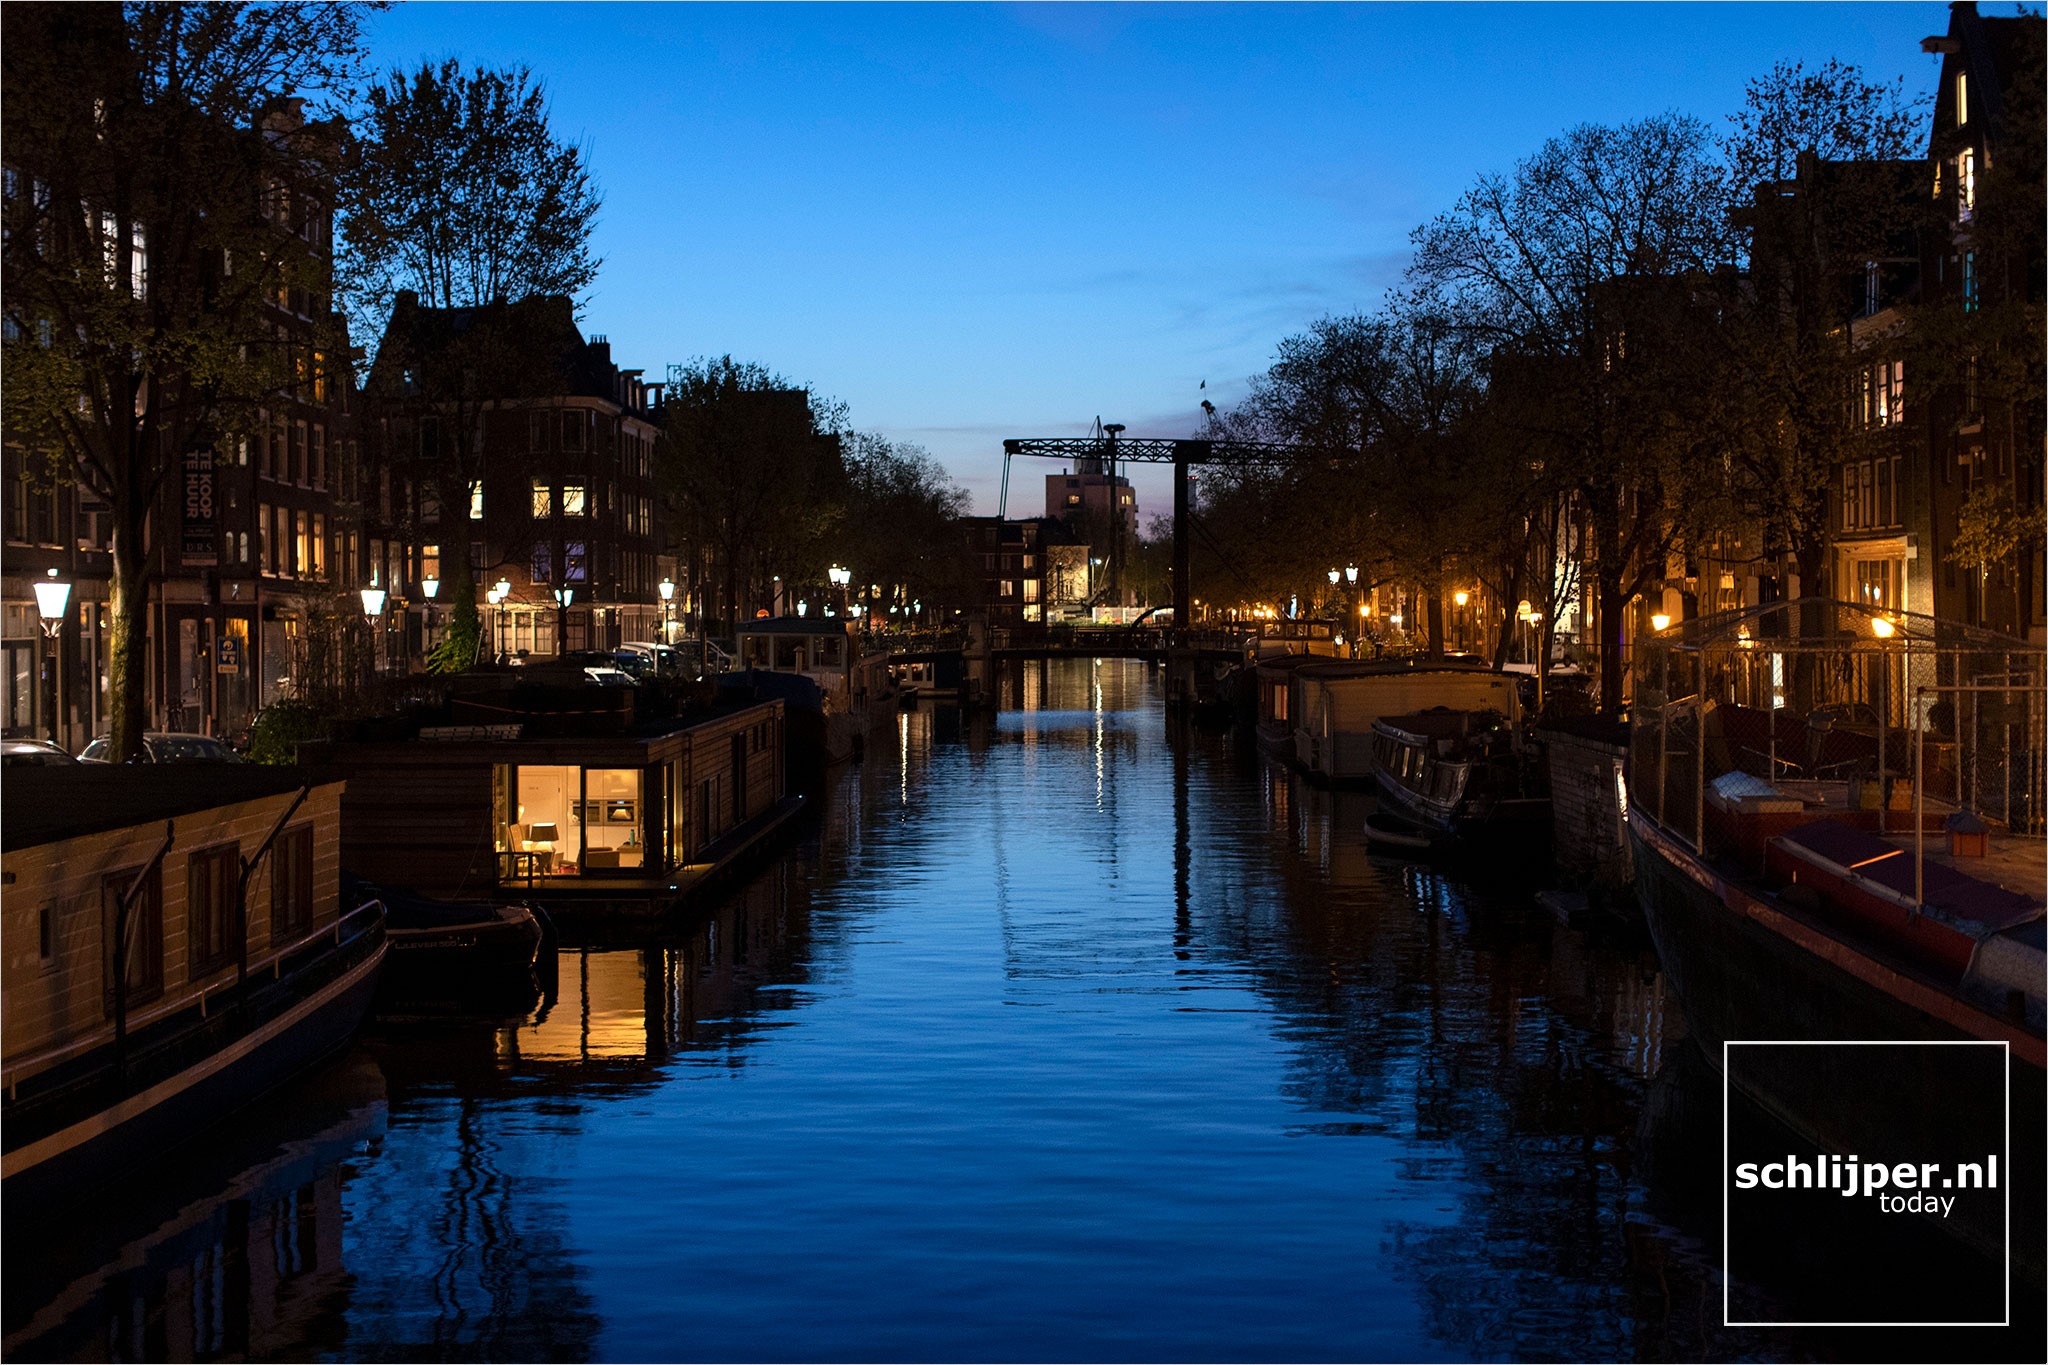 The Netherlands, Amsterdam, 22 april 2021